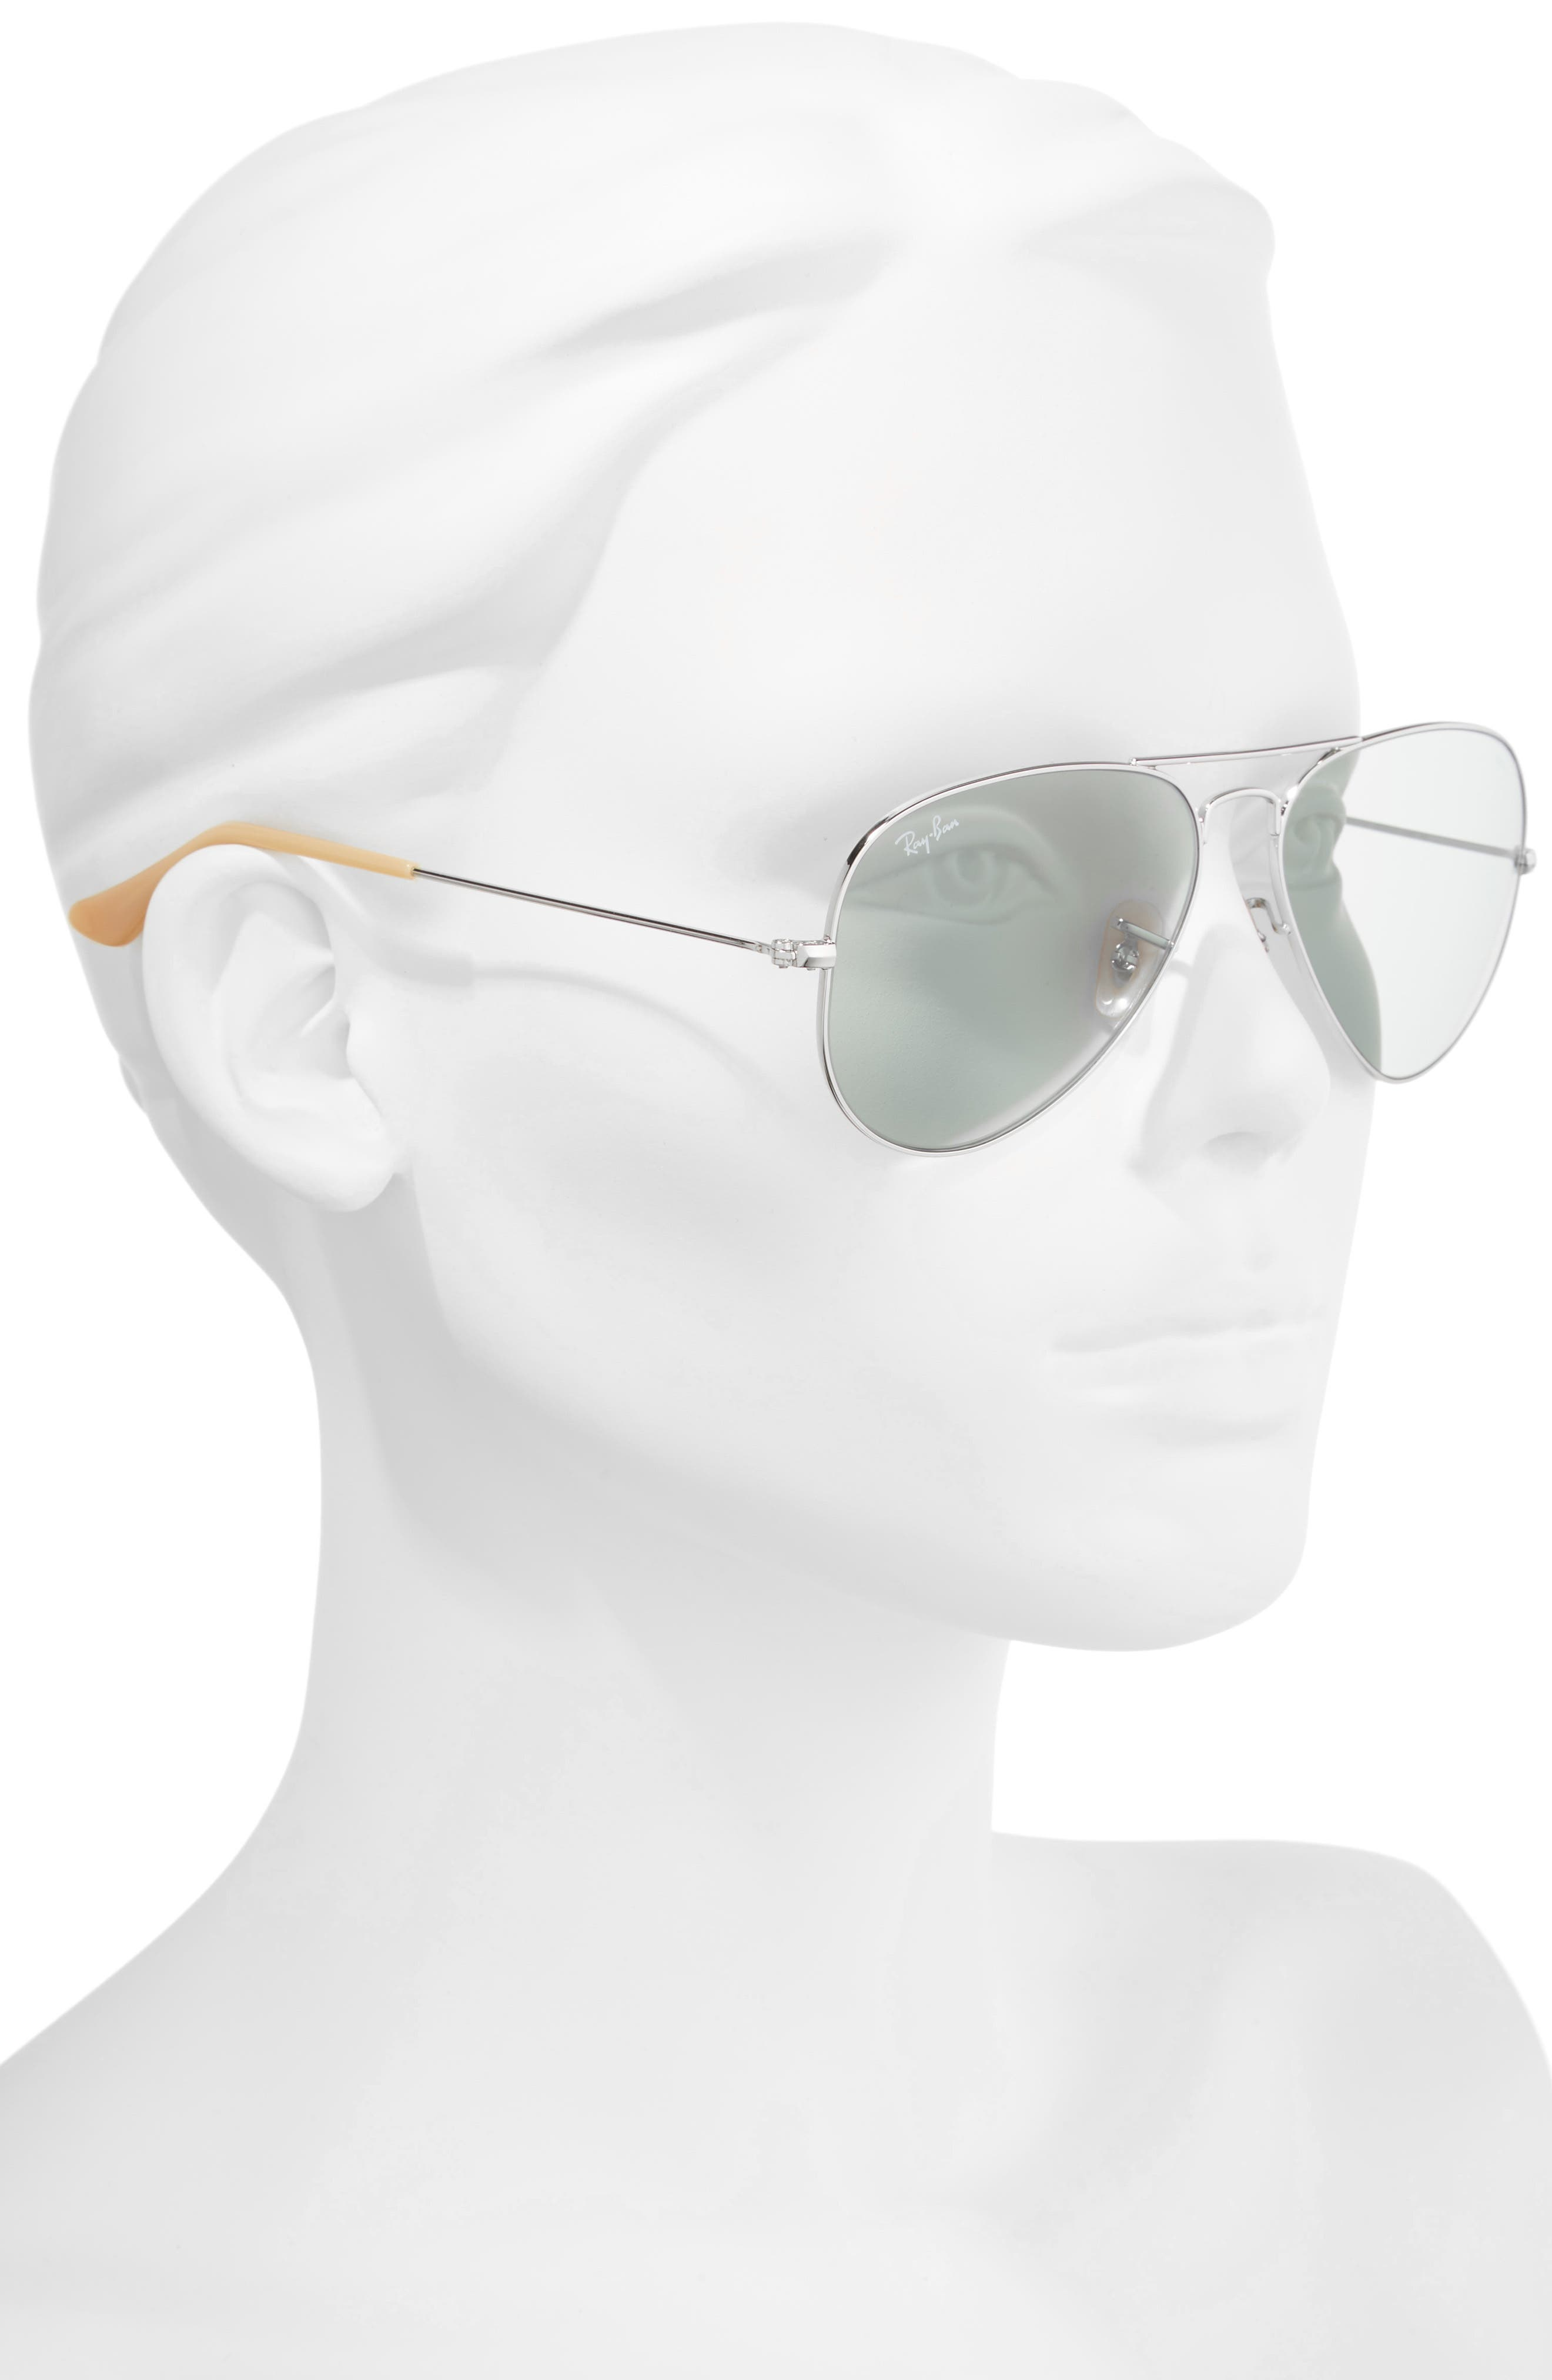 58mm Photochromic Aviator Sunglasses,                             Alternate thumbnail 2, color,                             Silver Blue